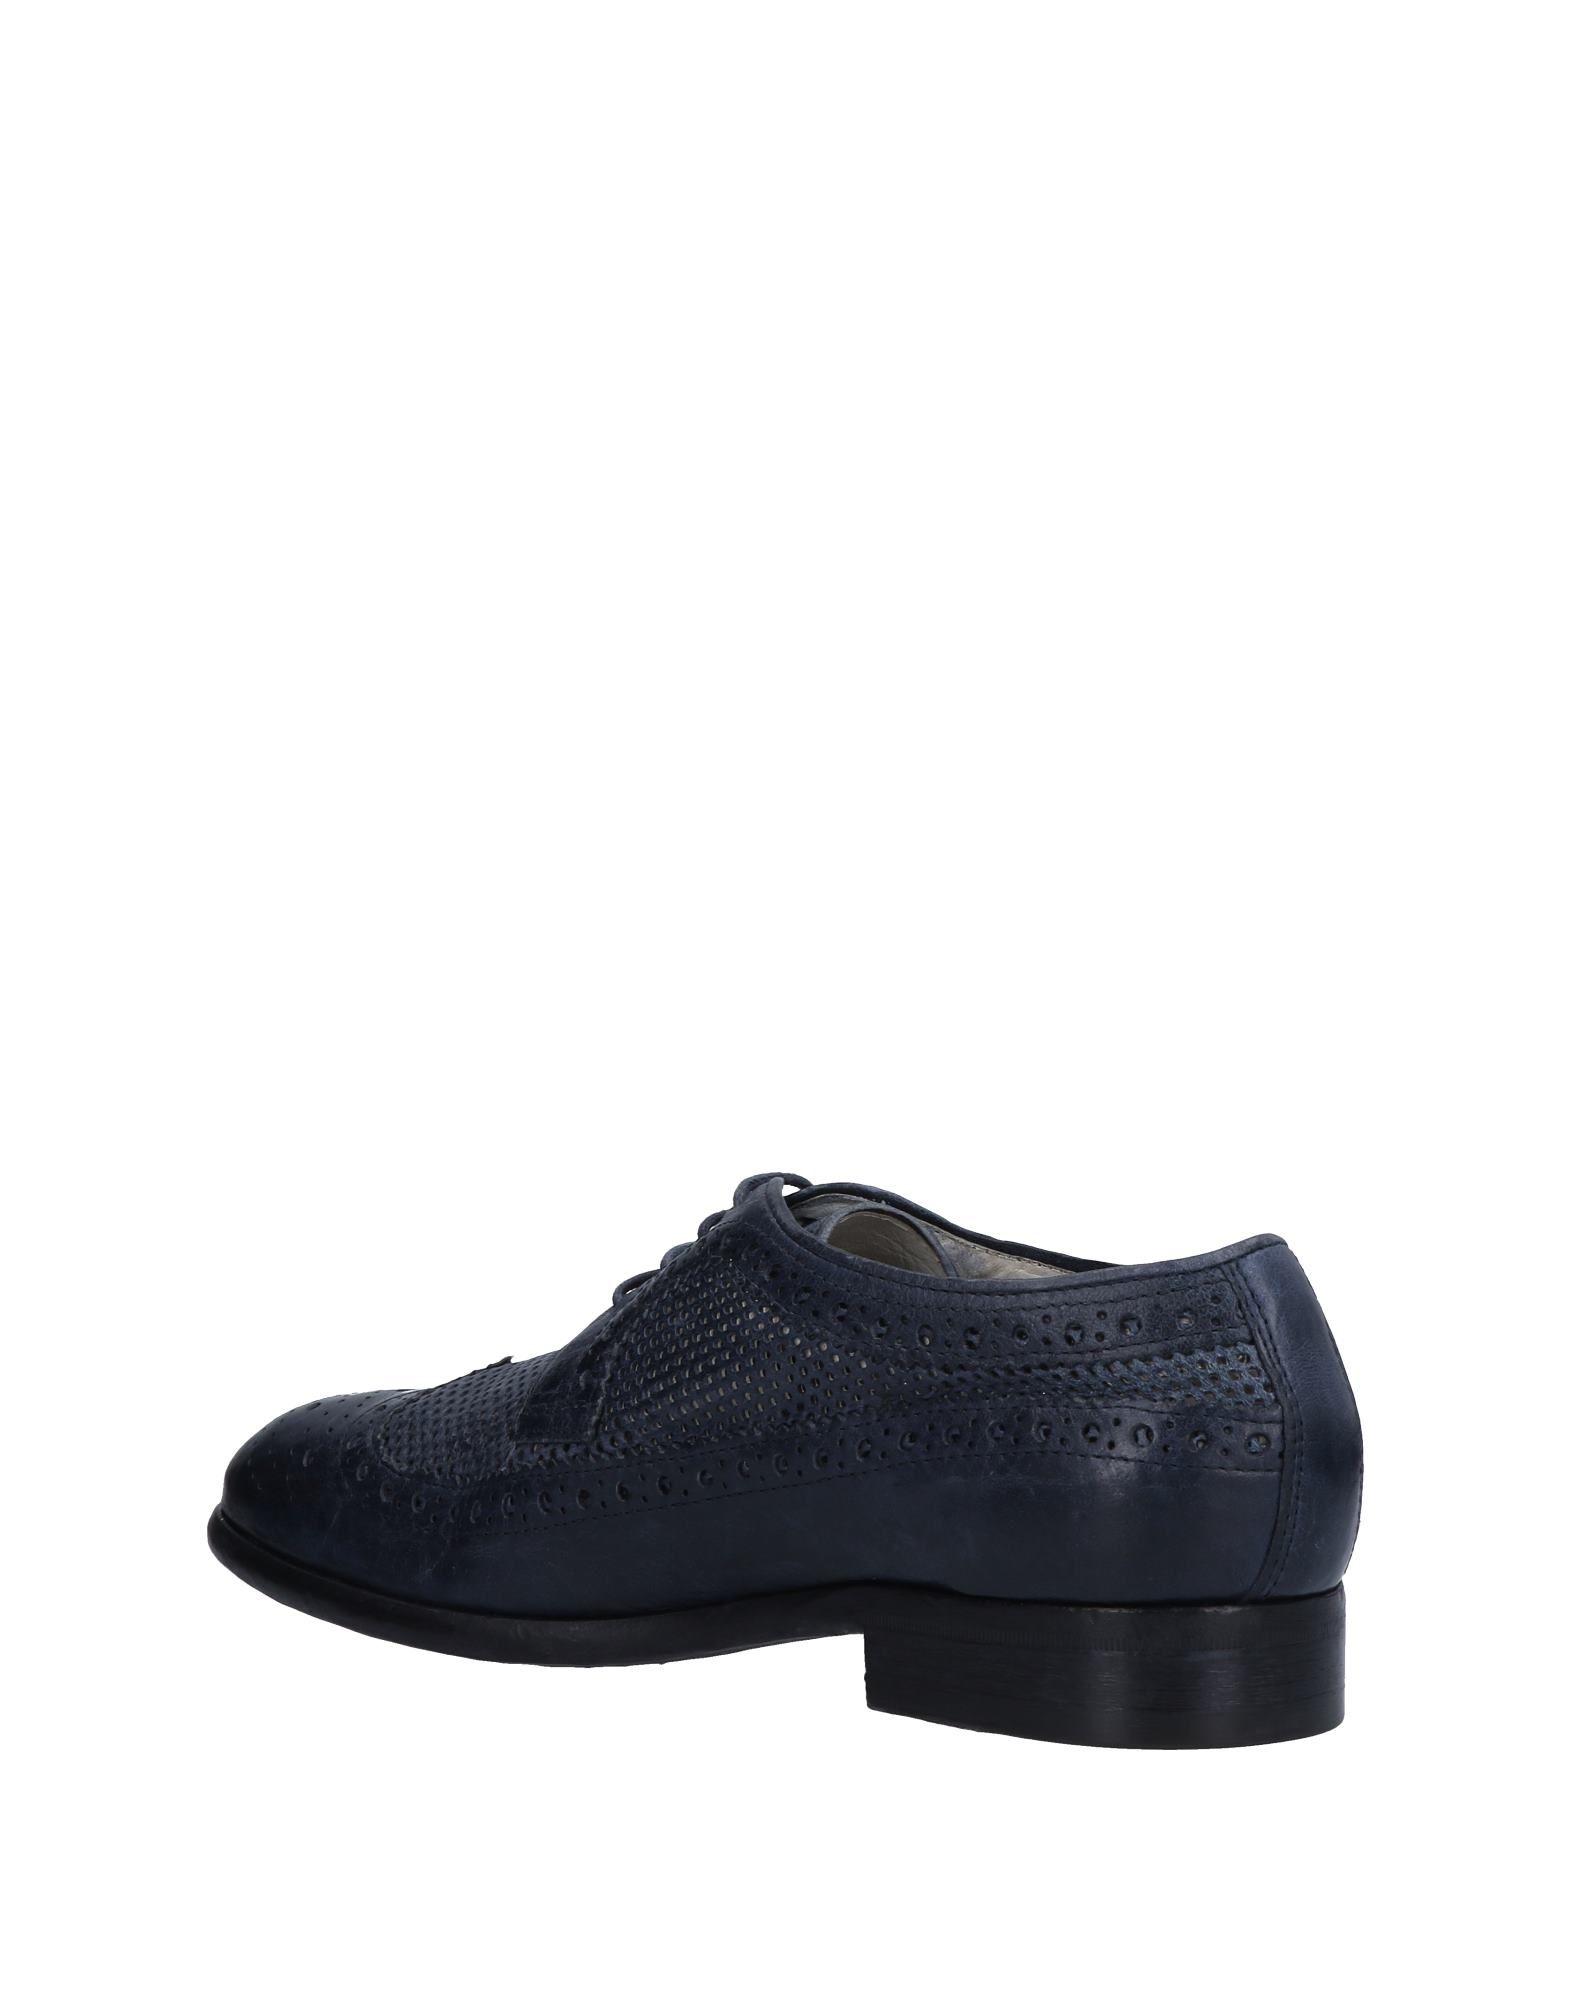 Corvari Schnürschuhe Schuhe Herren  11520457QN Heiße Schuhe Schnürschuhe 58fba4